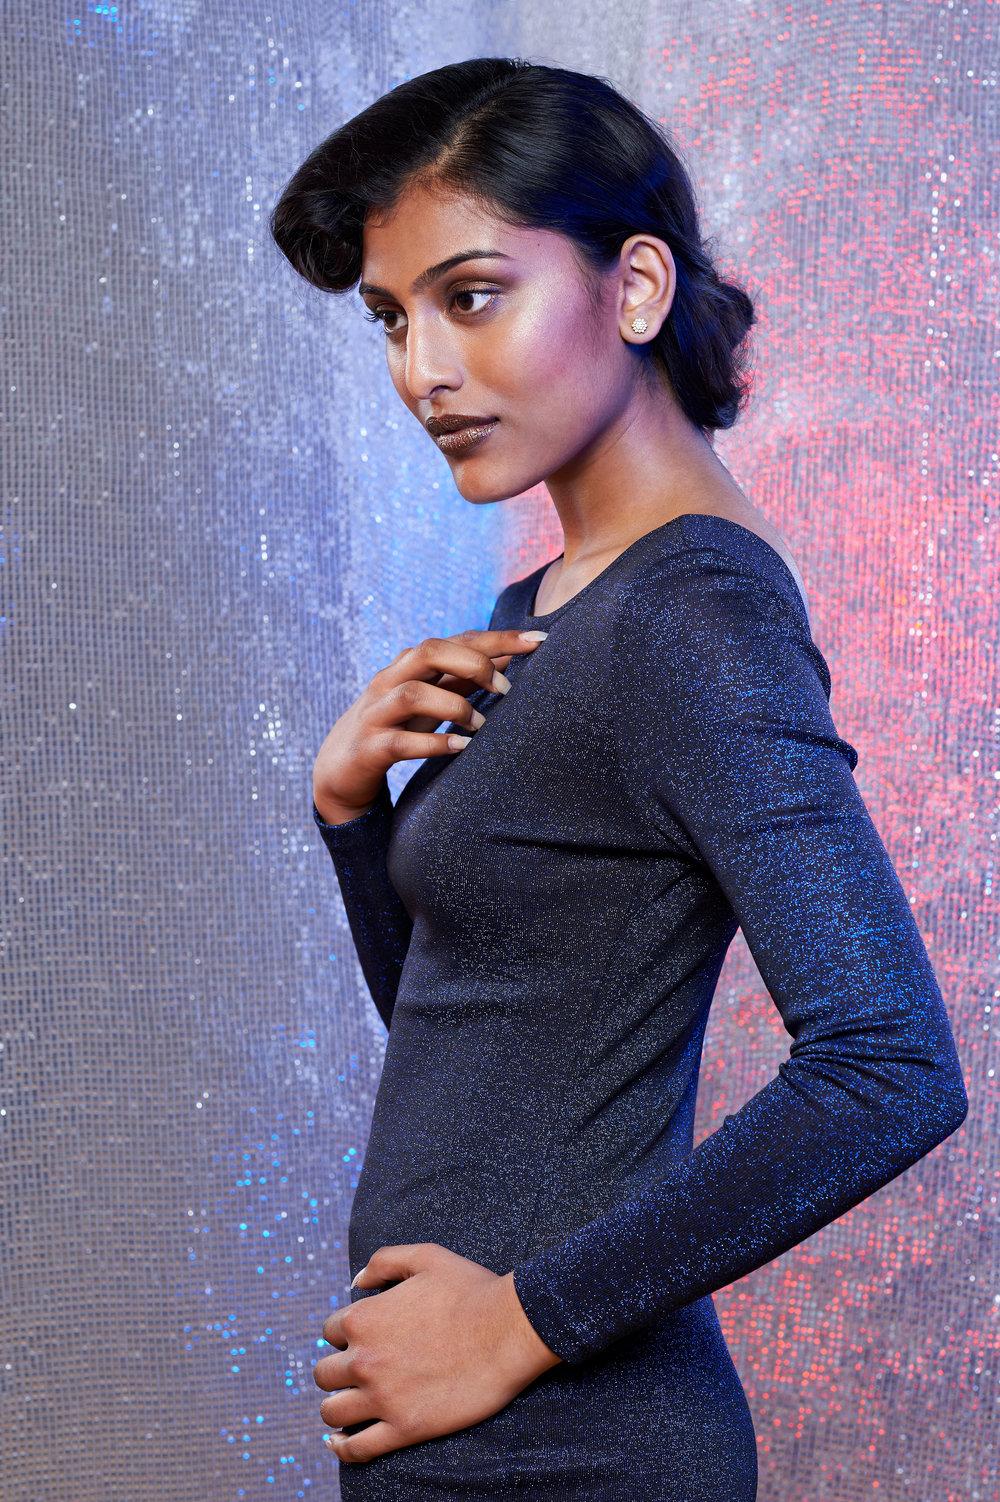 Marta-Hewson-Allison-Abraham-Model Portfolio-9054.jpg